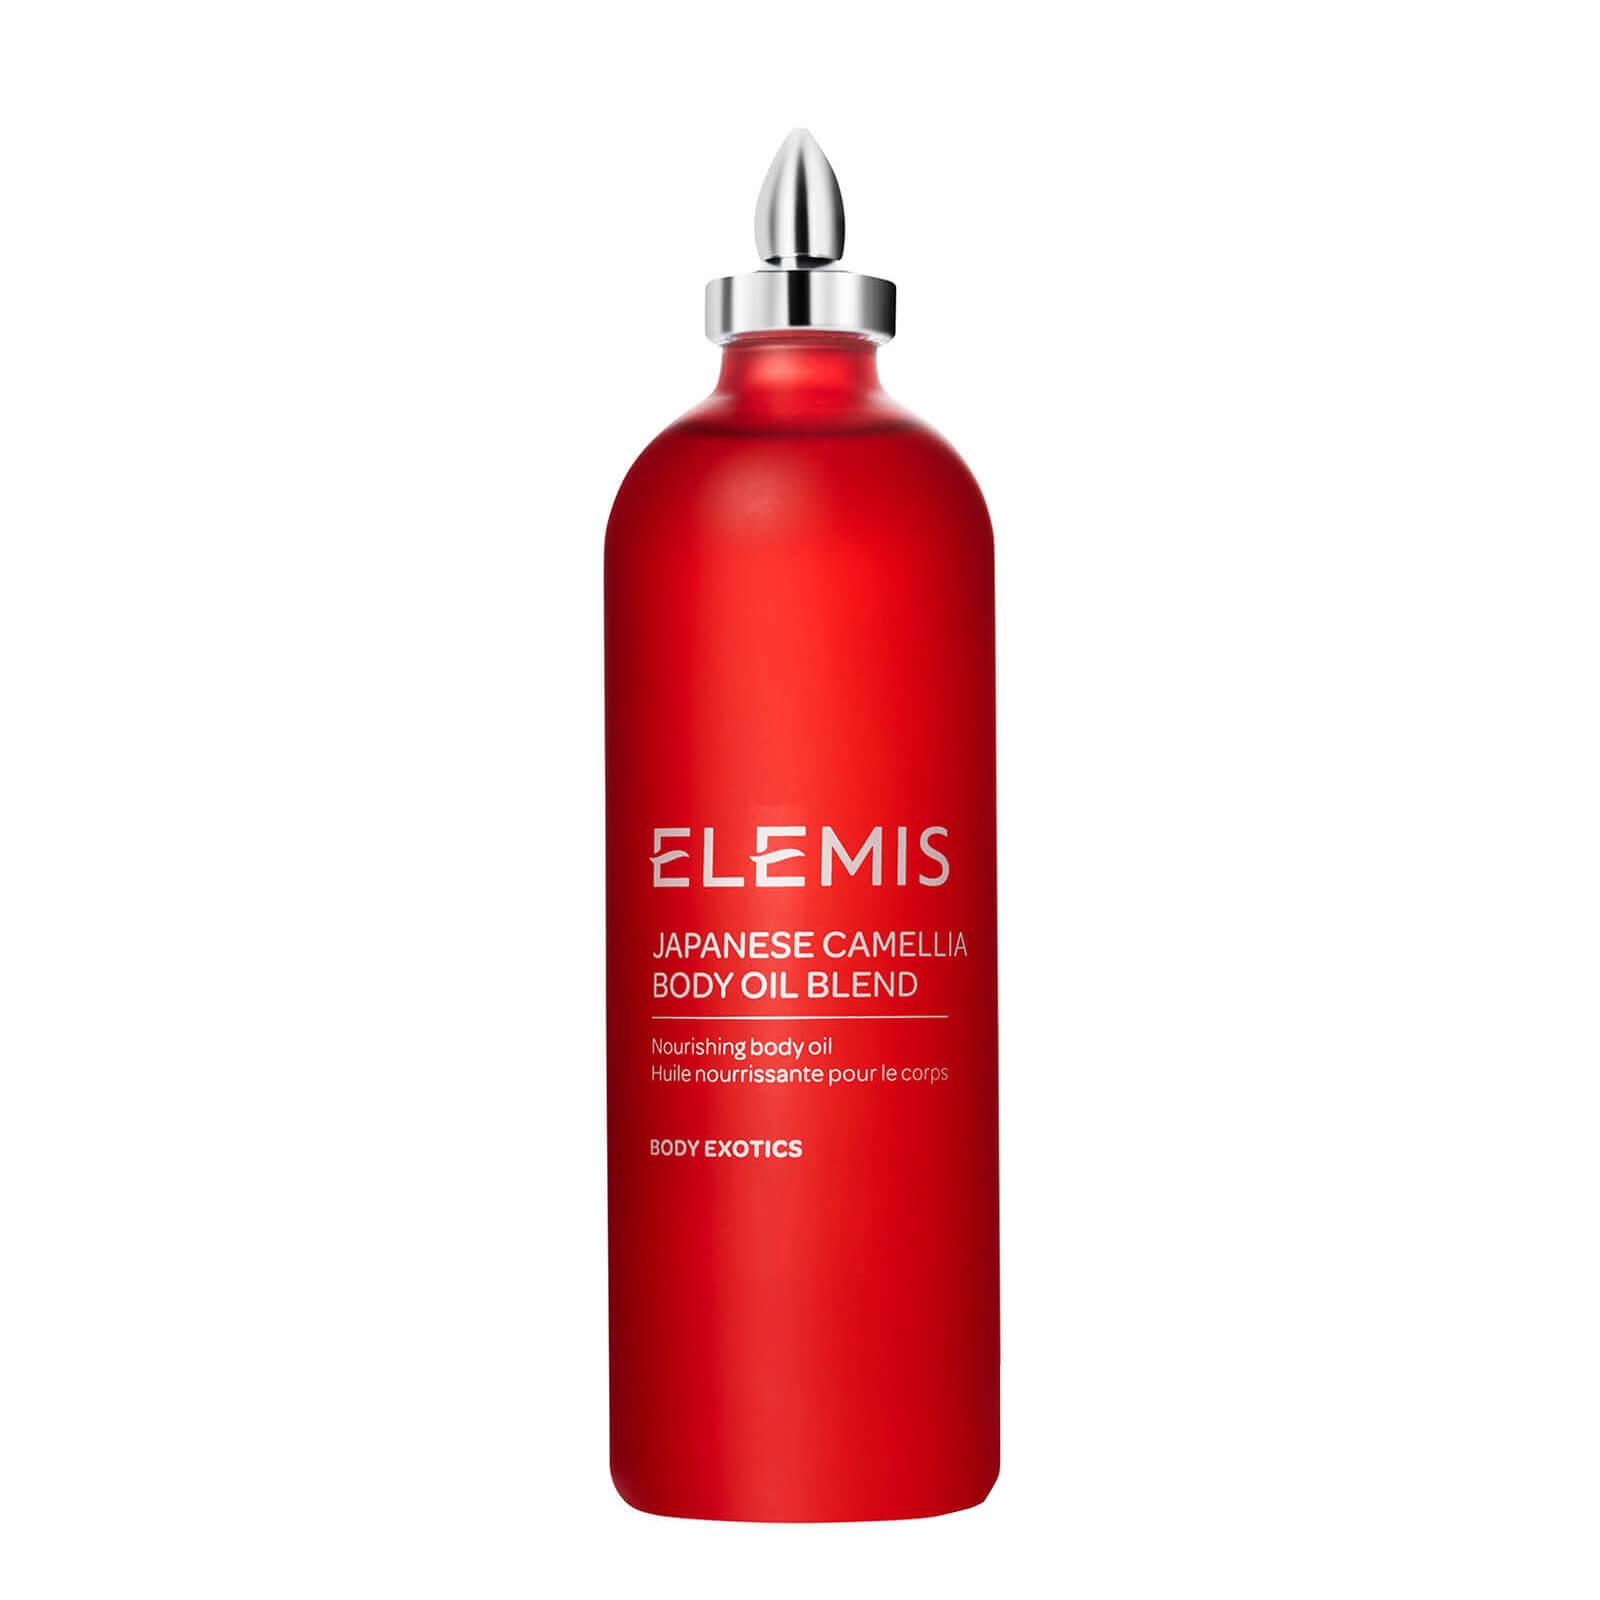 Купить Elemis Japanese Camellia Body Oil Blend 100ml